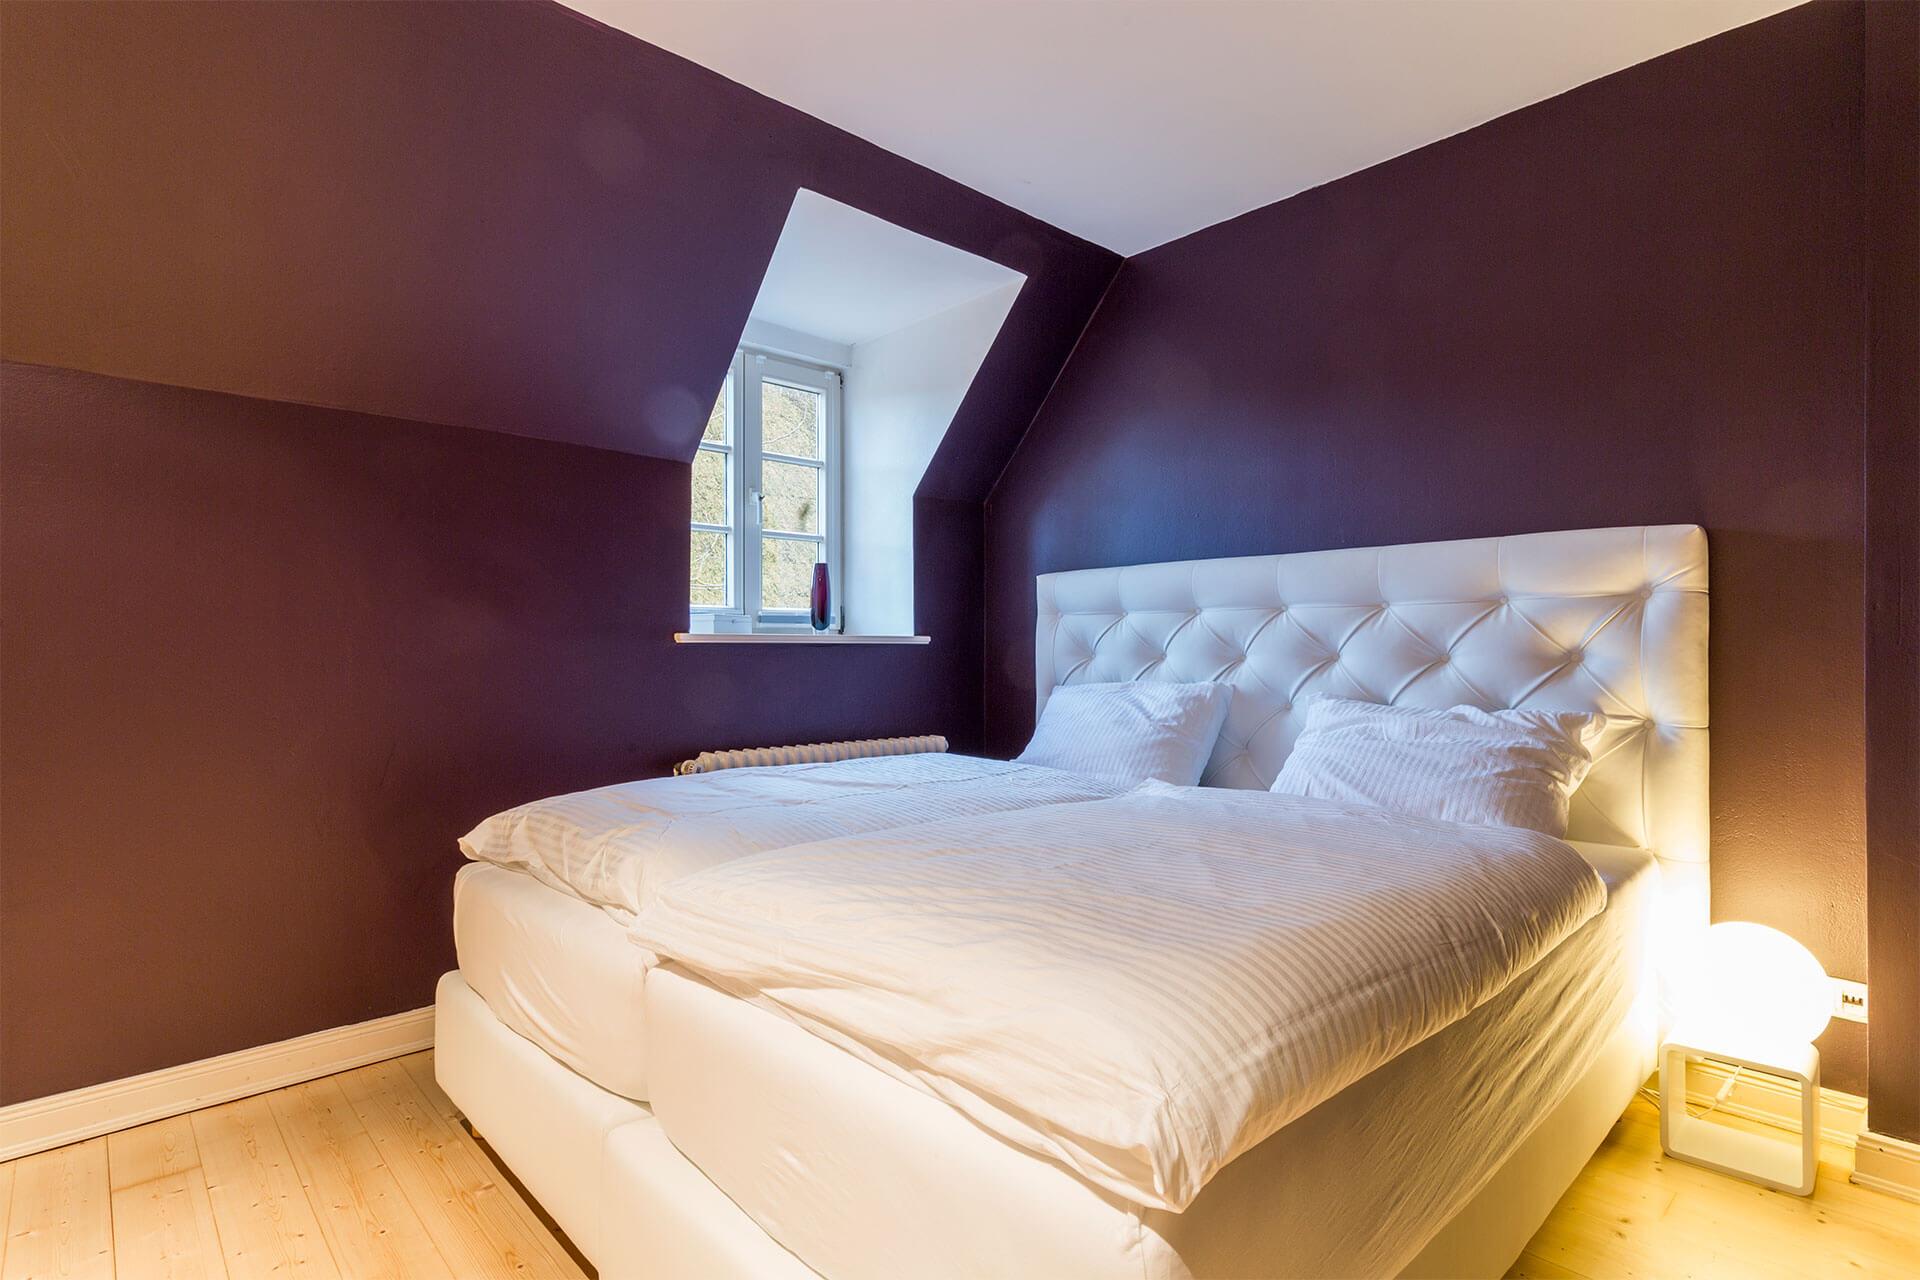 wandfarbe auen test beautiful elegantes bauhaus farben swing color wandfarbe im test. Black Bedroom Furniture Sets. Home Design Ideas